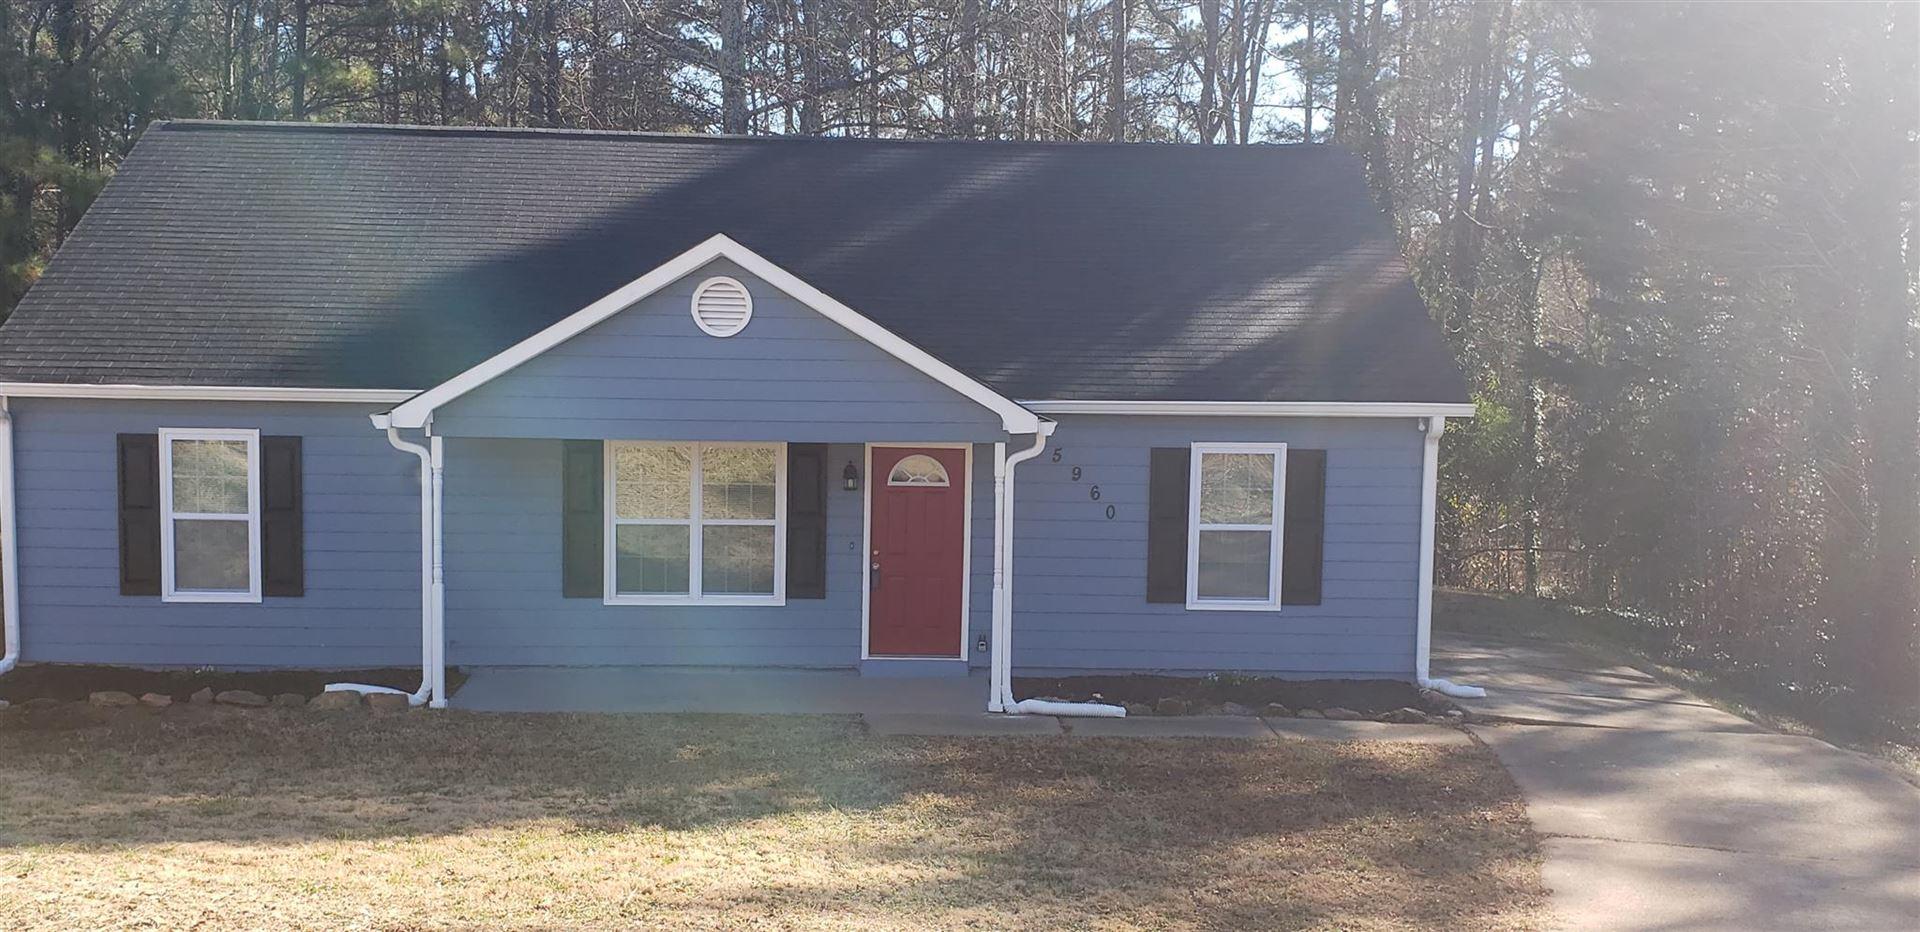 5960 Homestead Cir, Rex, GA 30273 - MLS#: 8906064